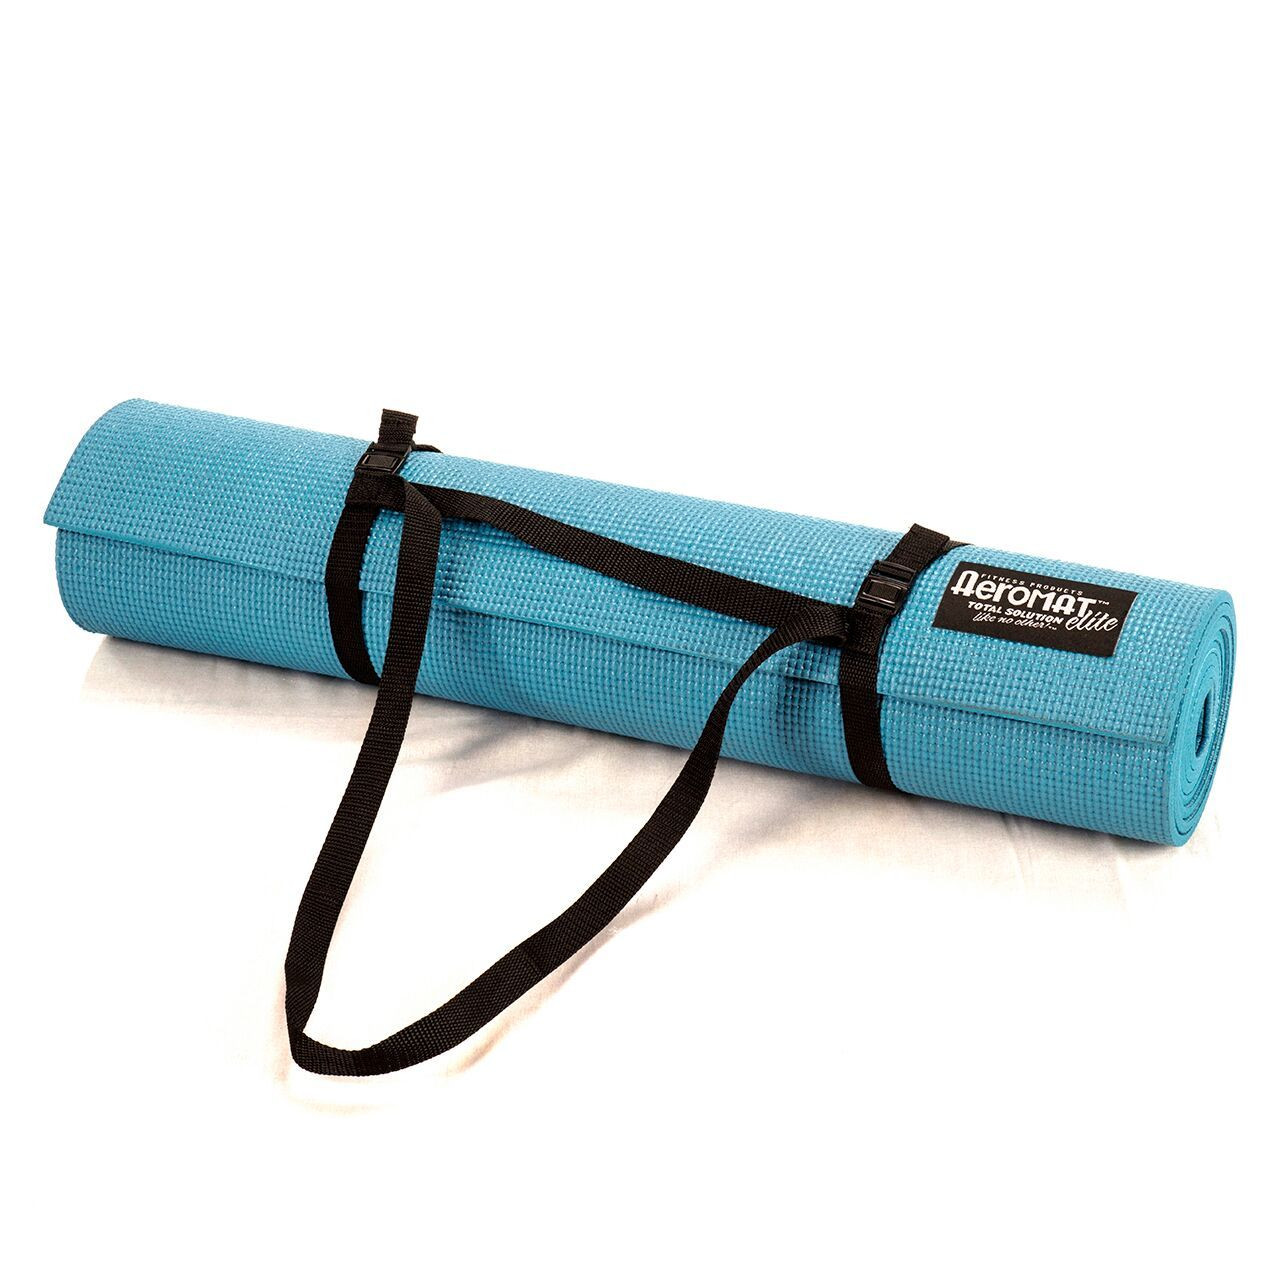 Aeromat Elite Yoga / Pilates Workout Mat W/ Harness